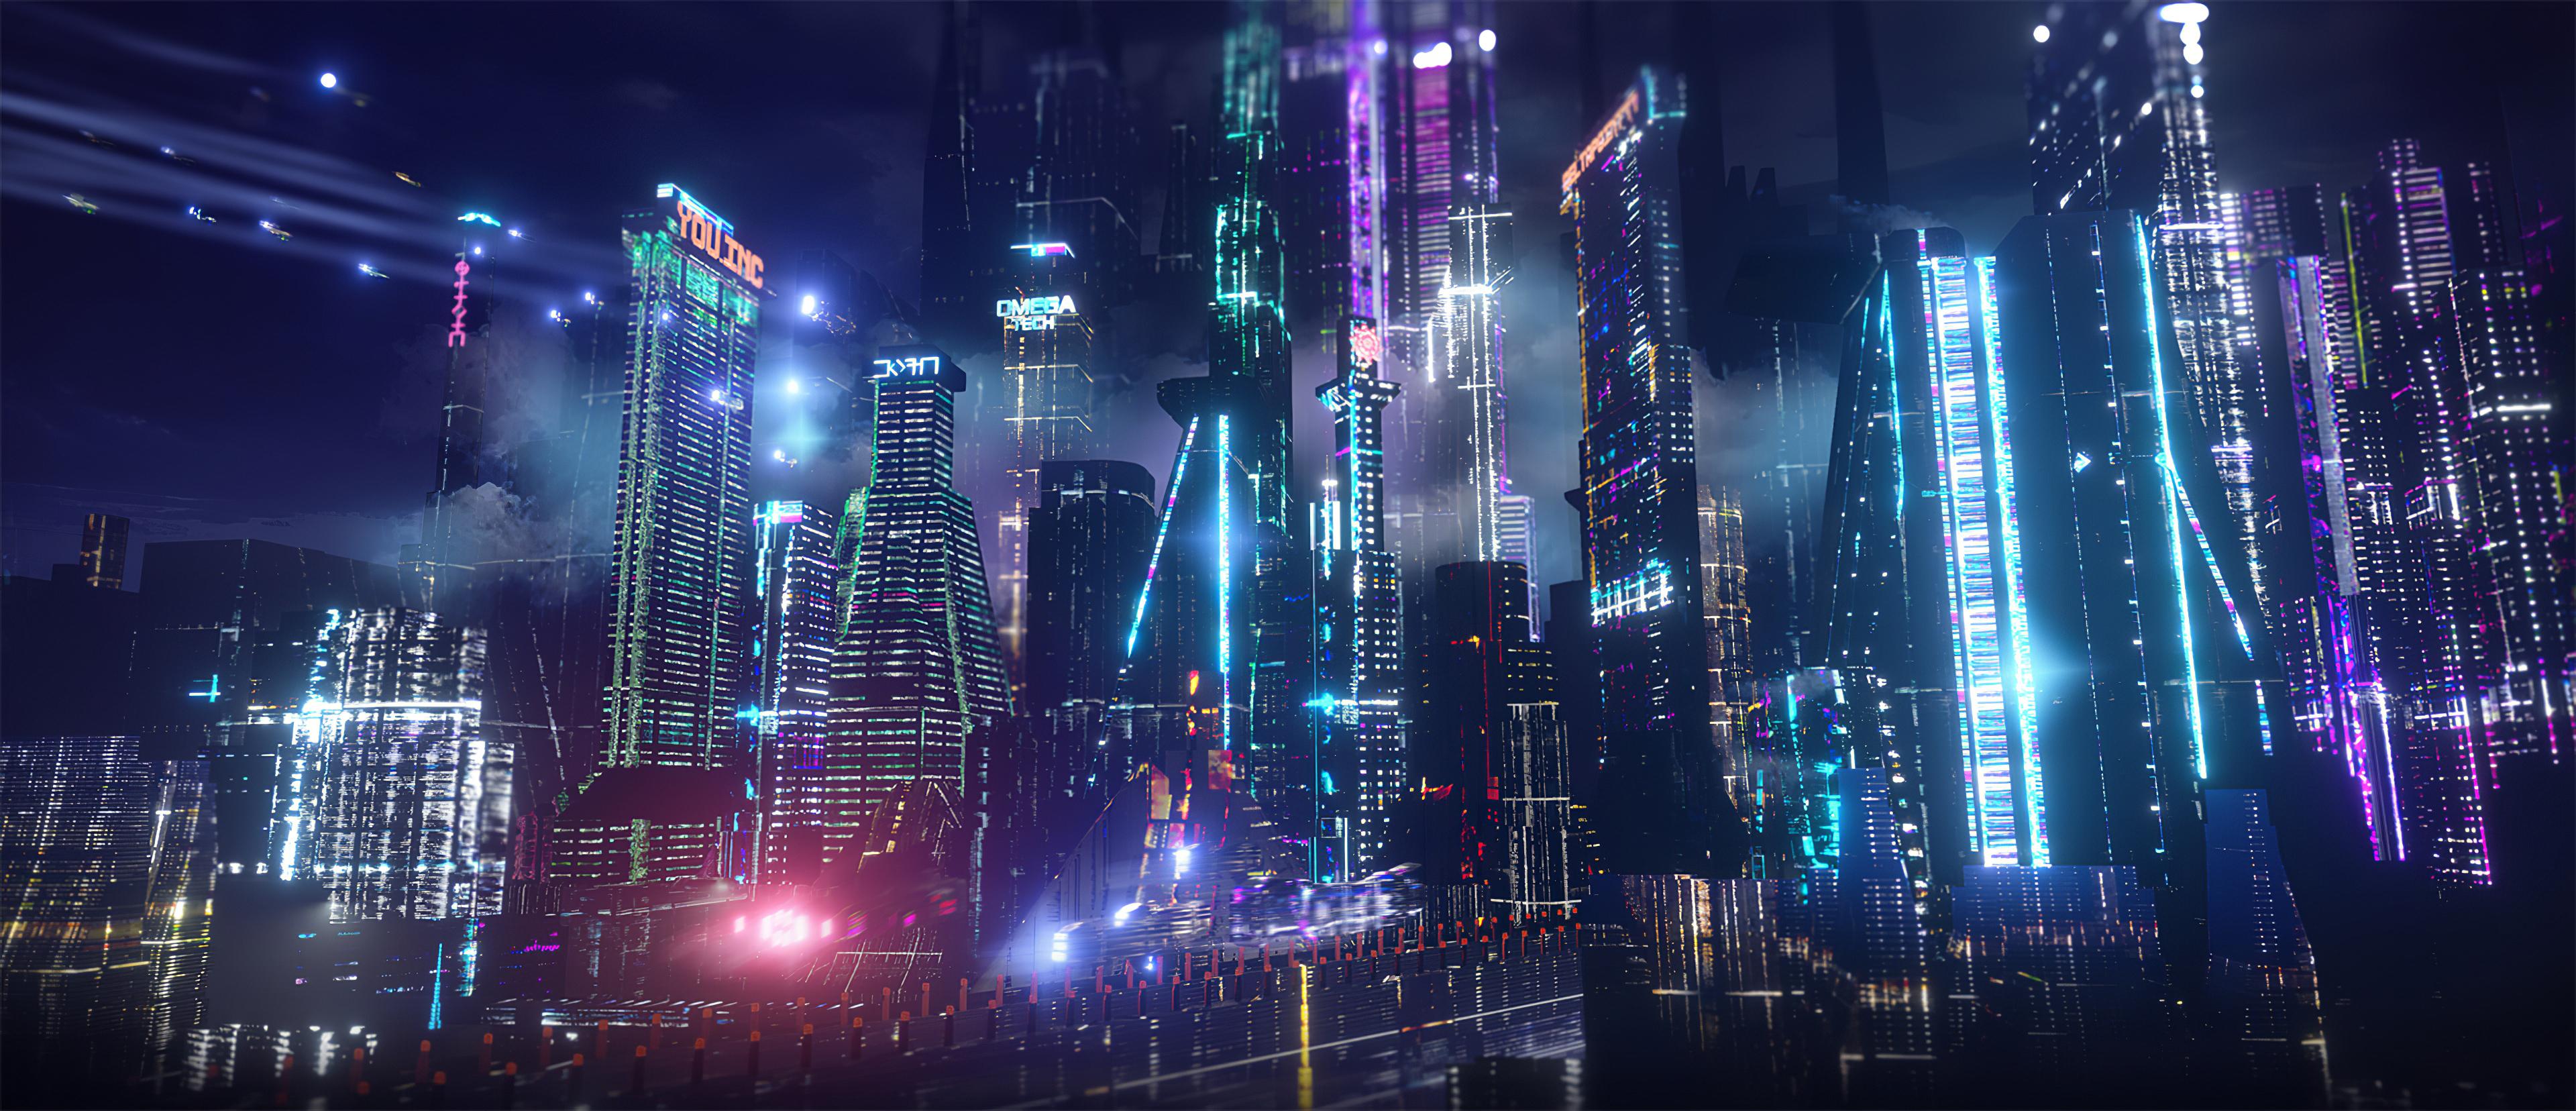 neon city lights 4k u3